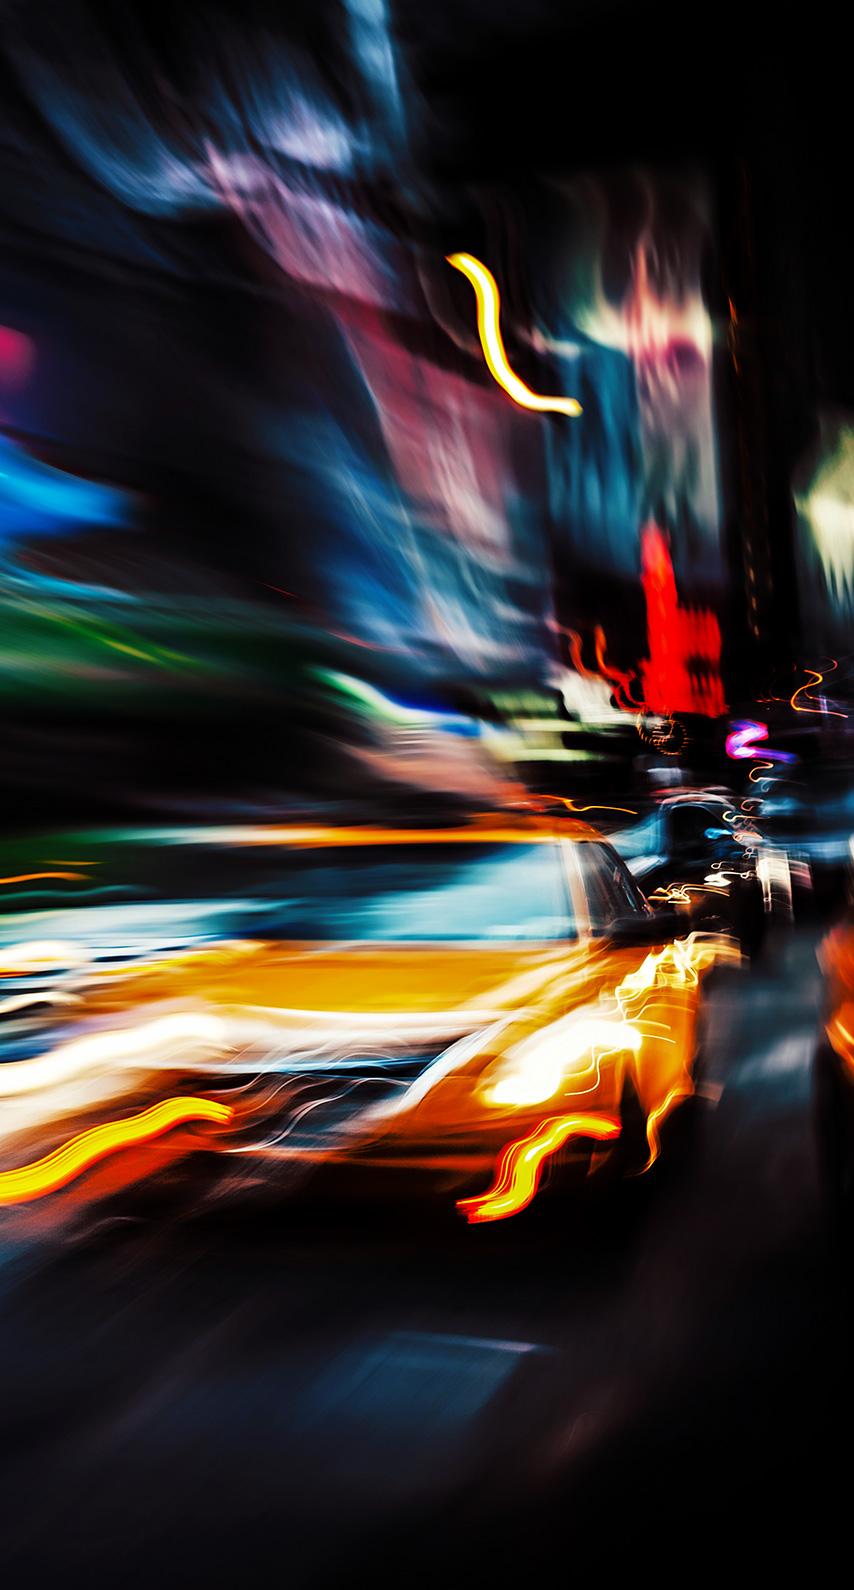 zoom, commuting